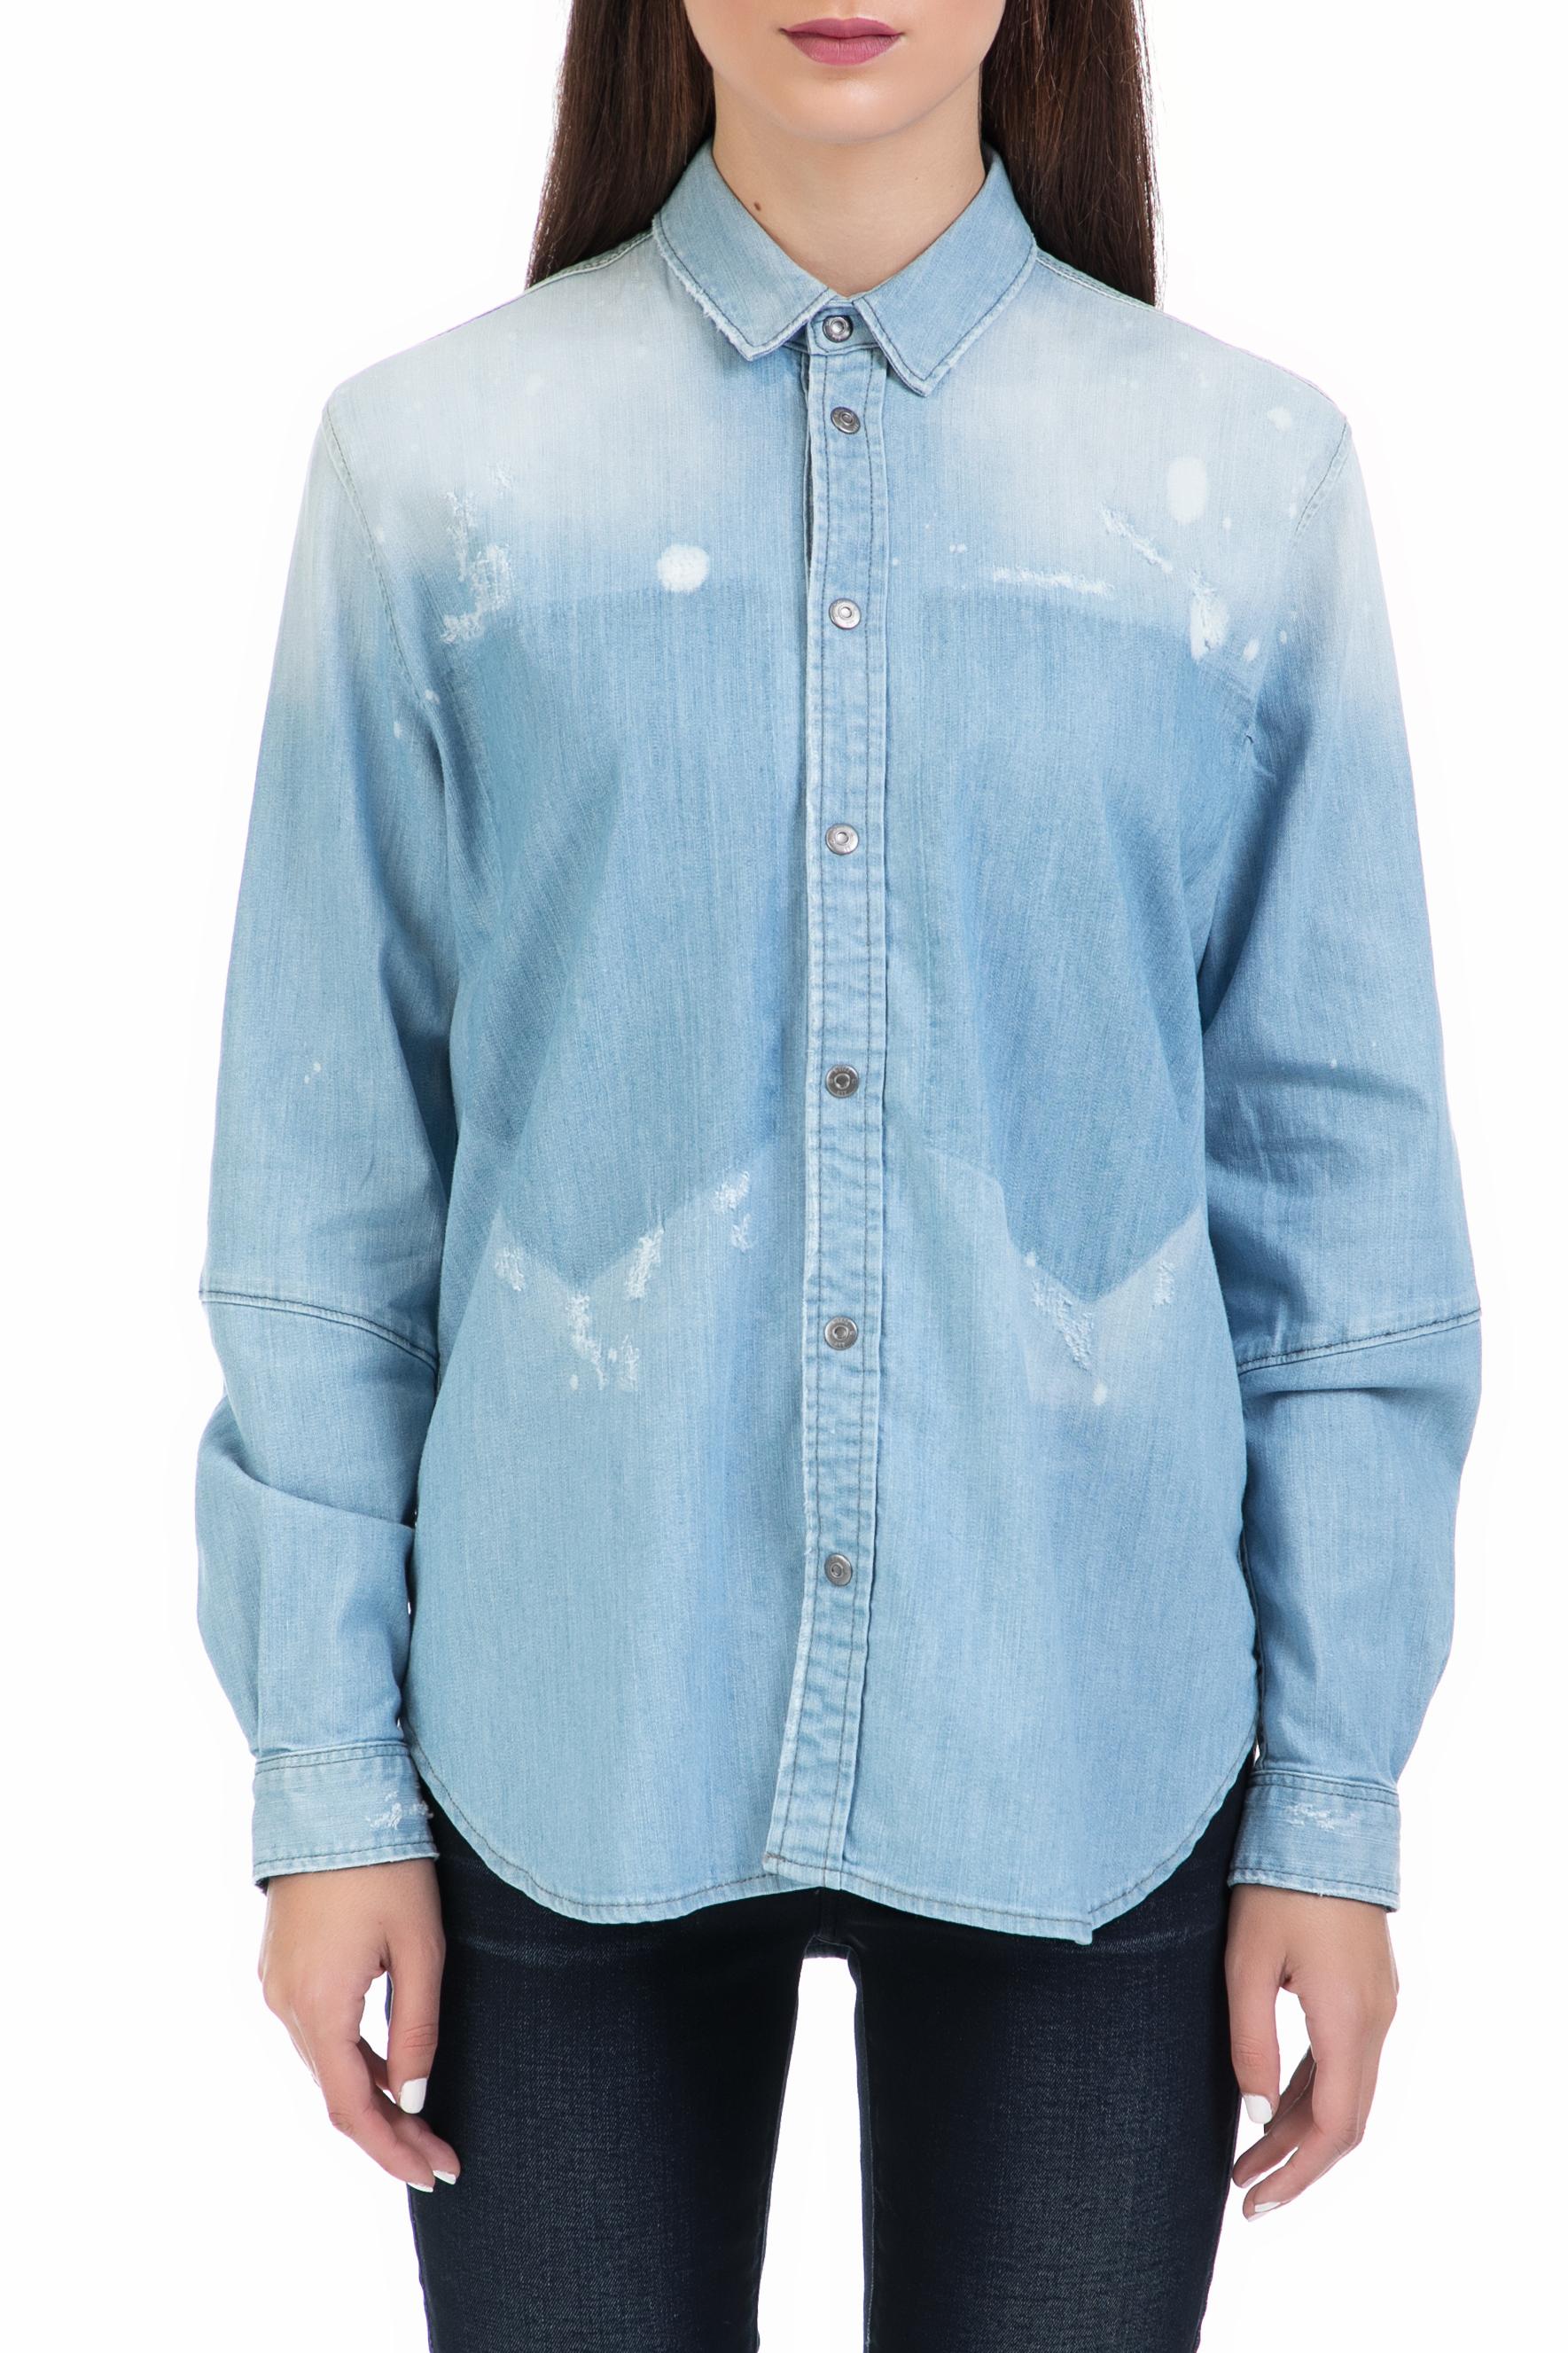 G-STAR RAW - Γυναικείο πουκάμισο Modern Arc 3D BF shirt μπλε γυναικεία ρούχα πουκάμισα μακρυμάνικα